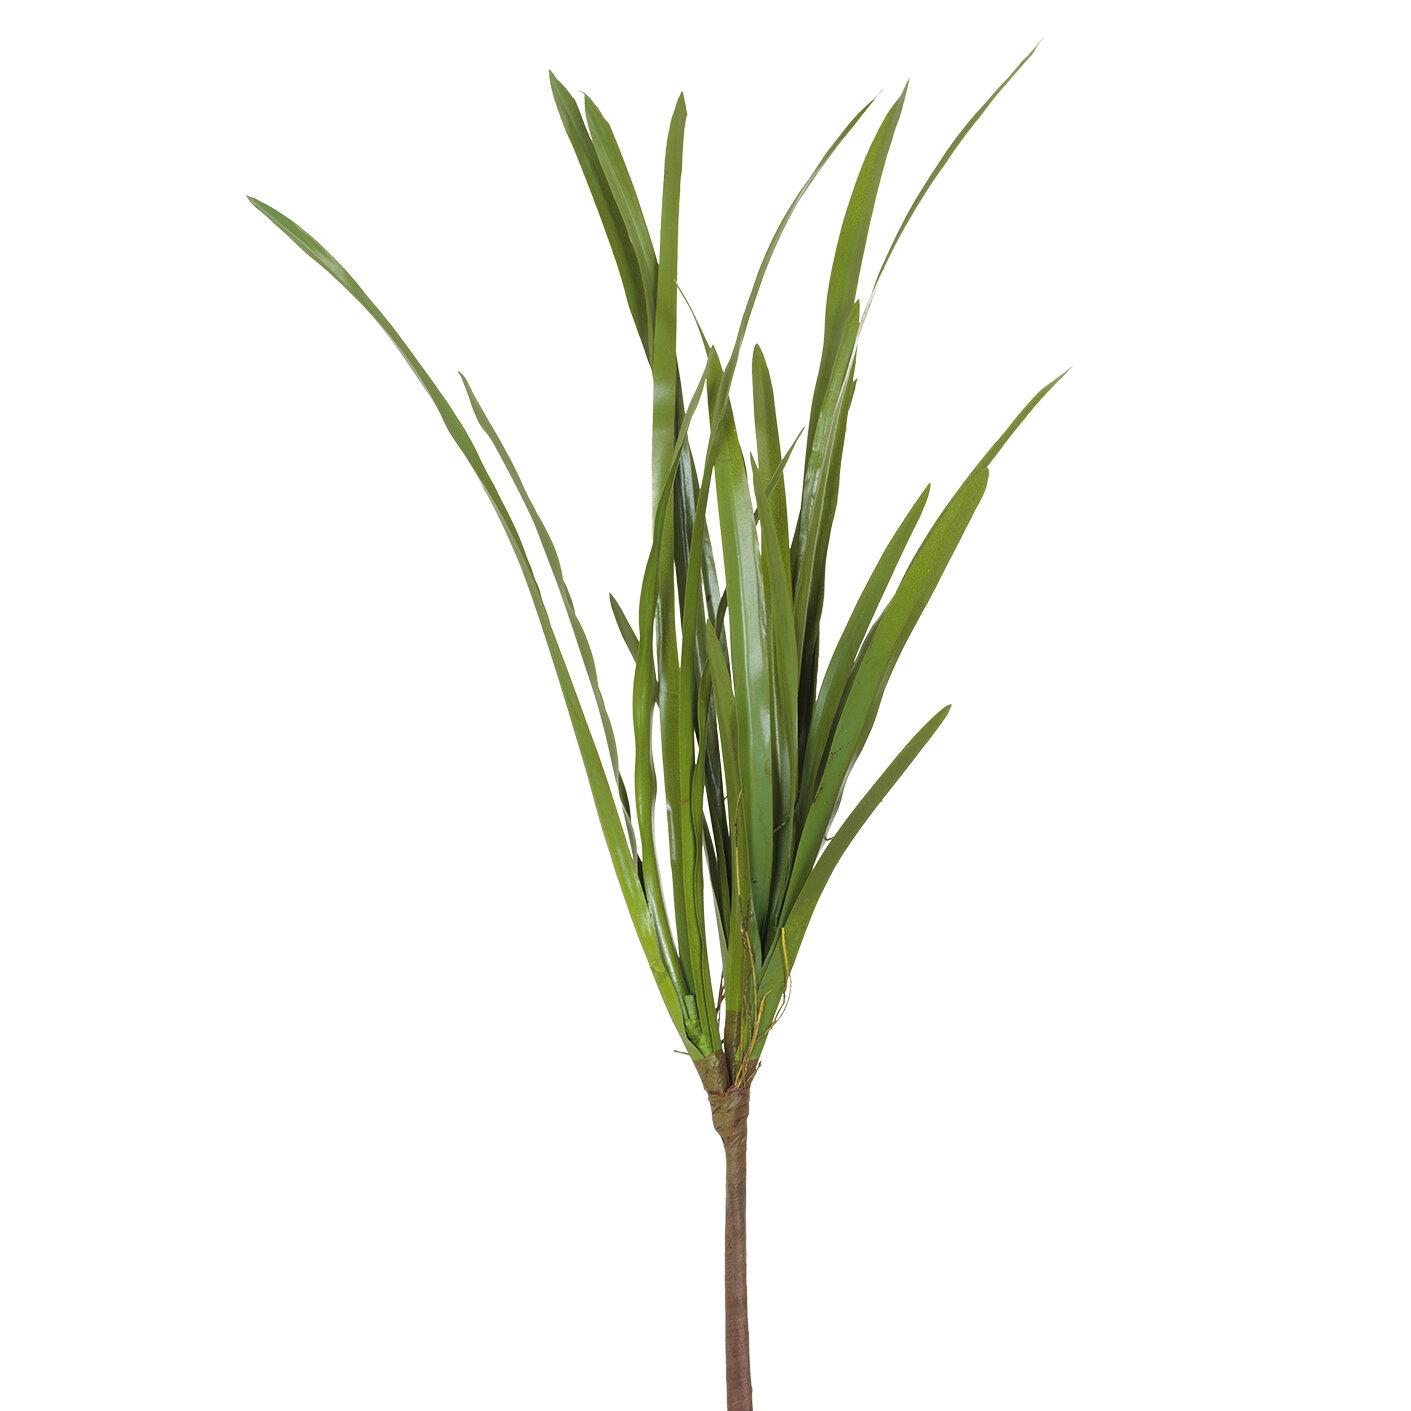 Grass Foliage Branch